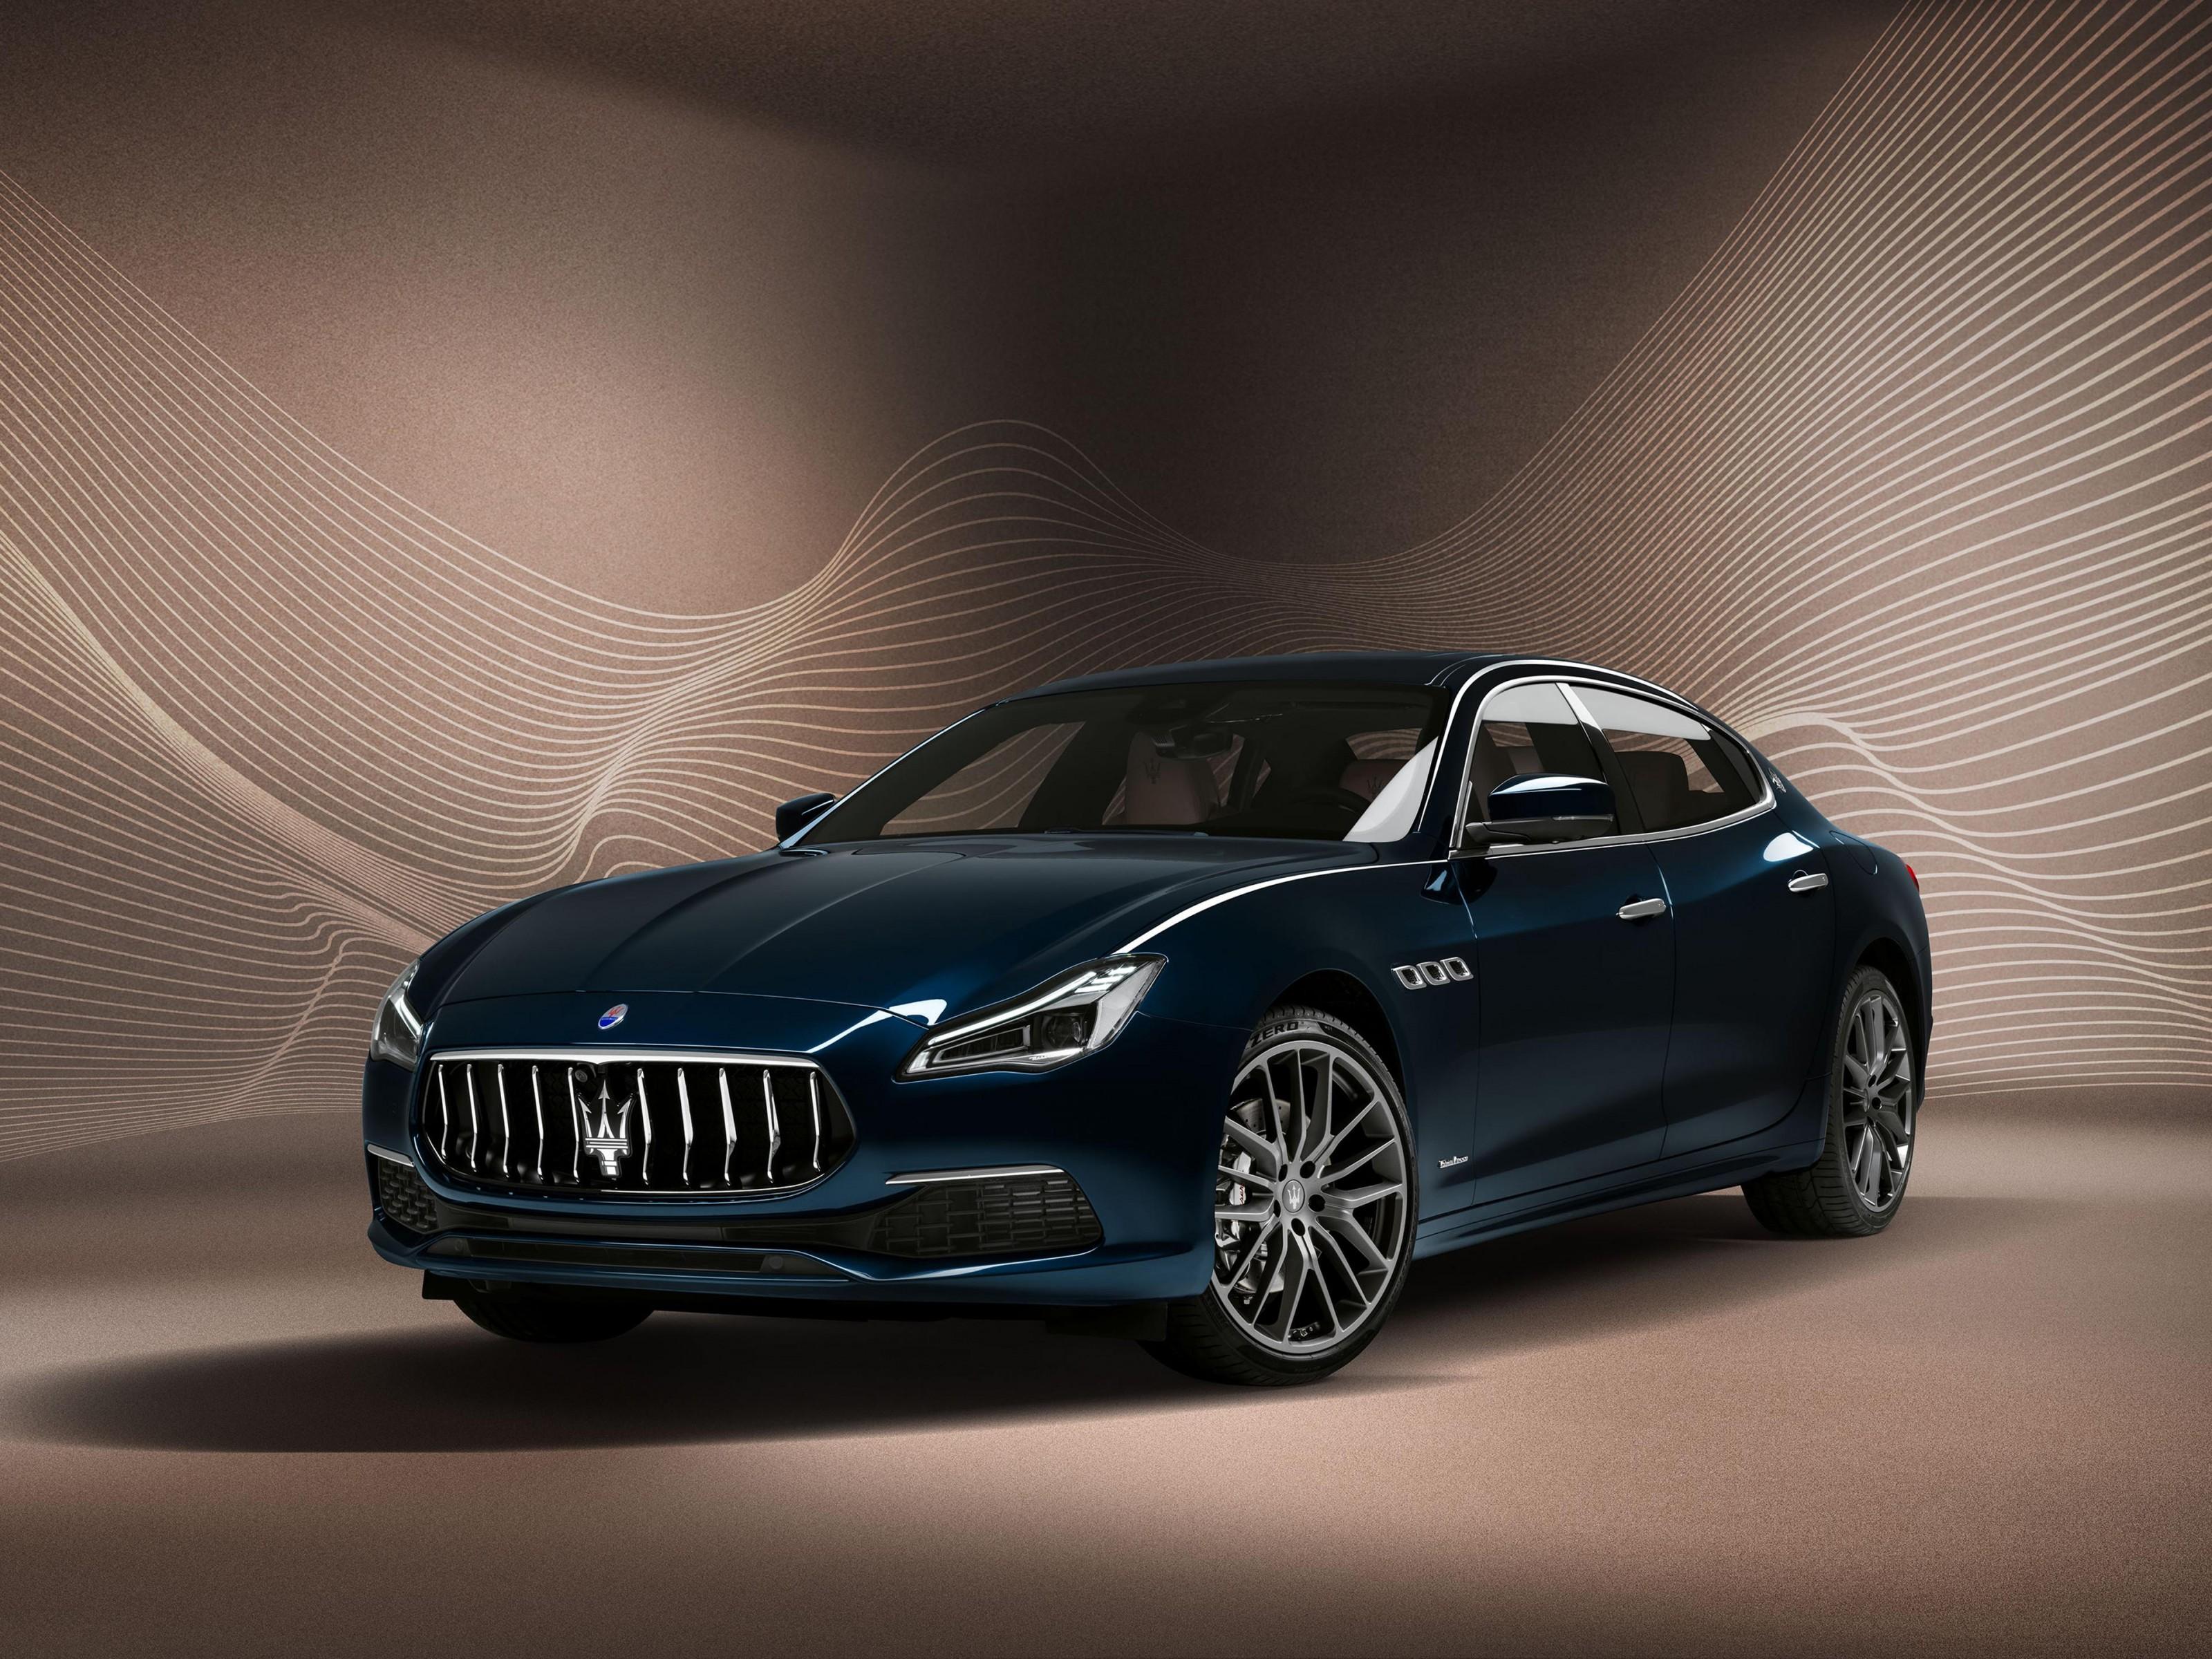 Maserati Quattroporte GranLusso Royale 2020 5K HD desktop 3200x2400